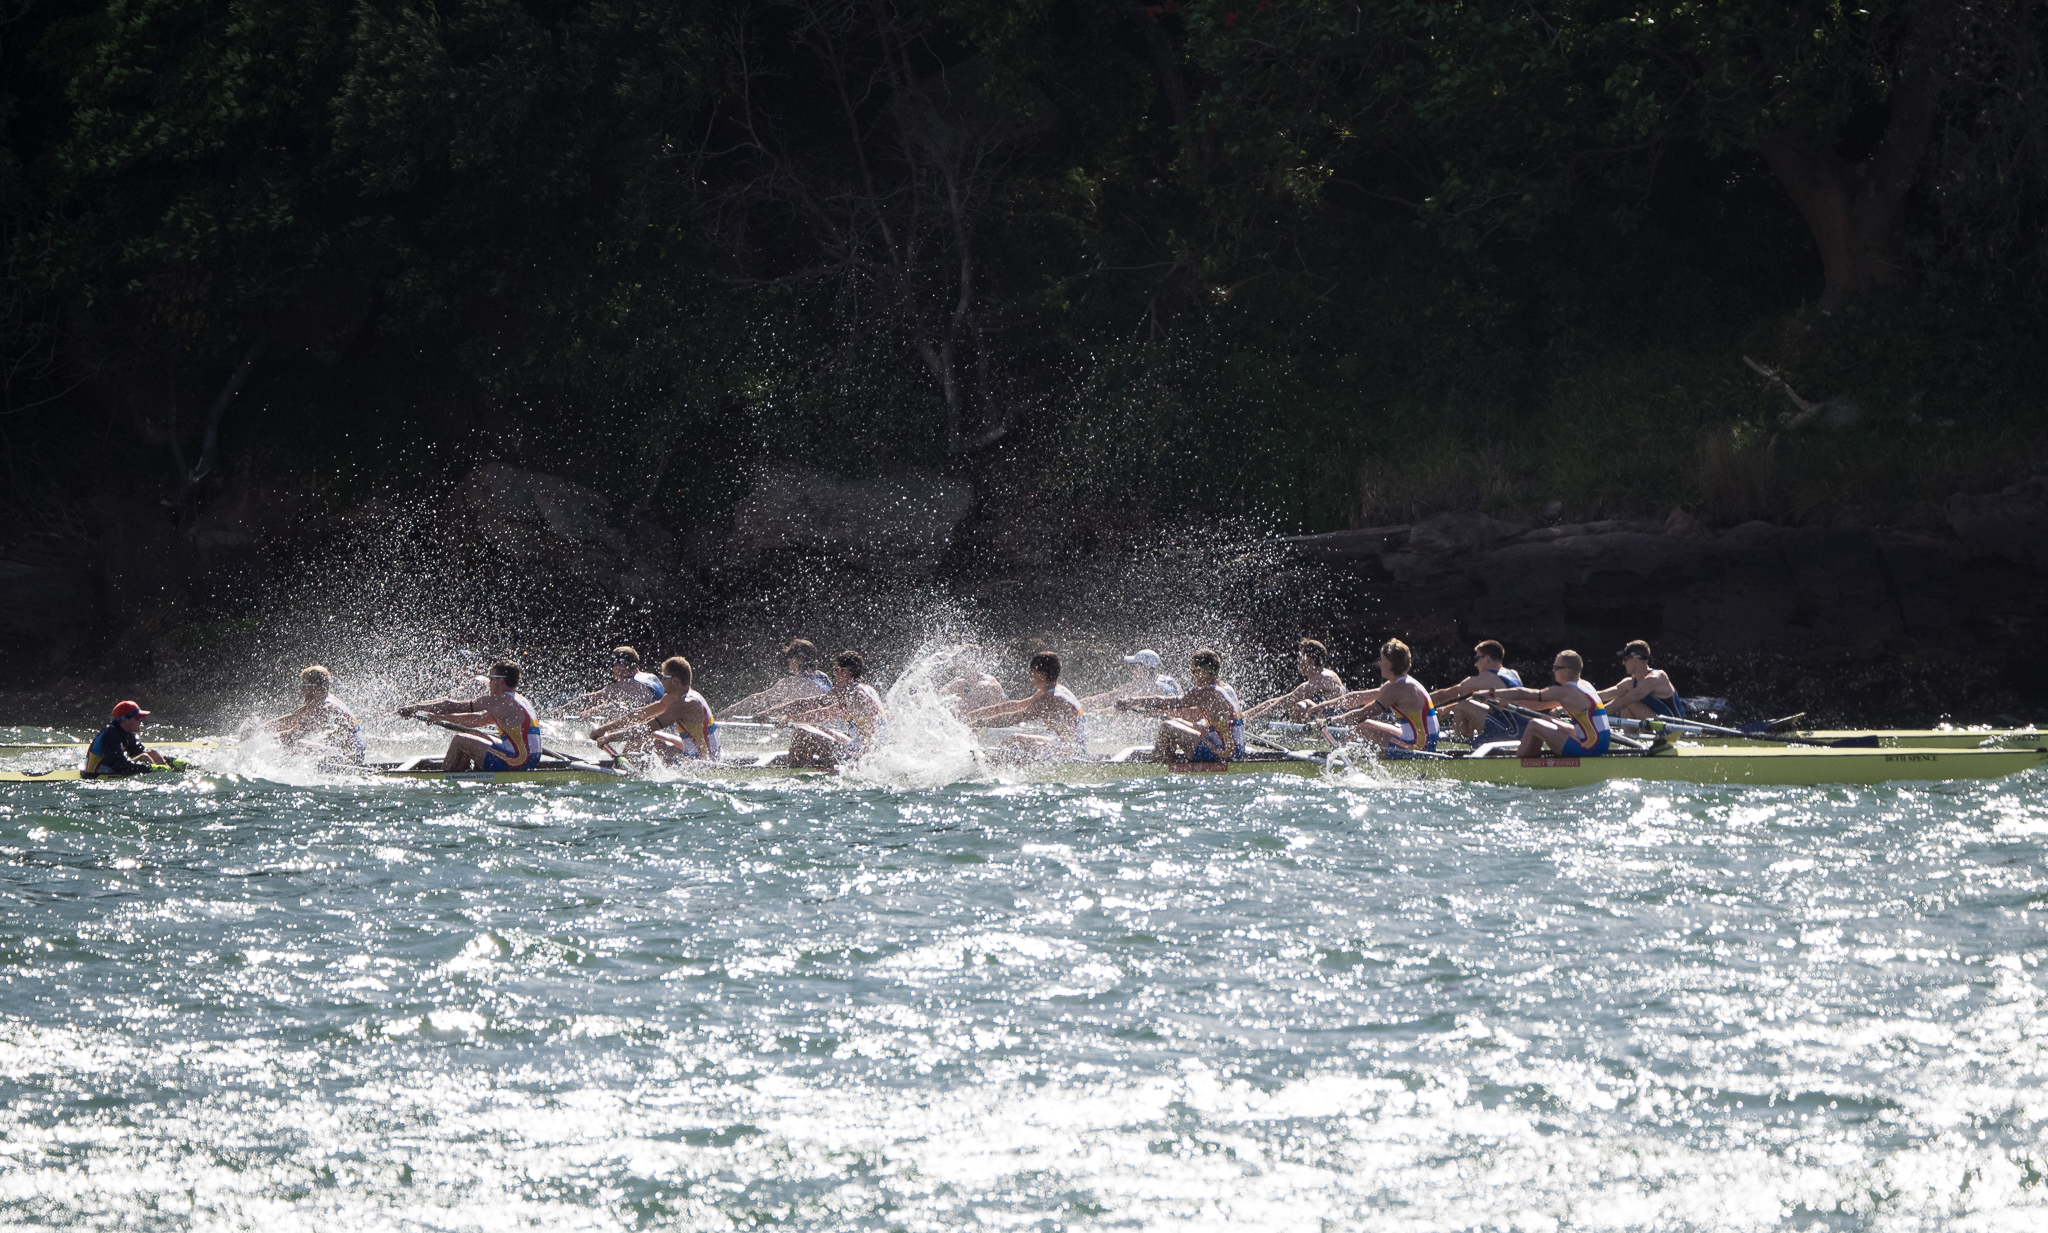 Boat Race 2016-15. Alan Shawjpg (9).jpg